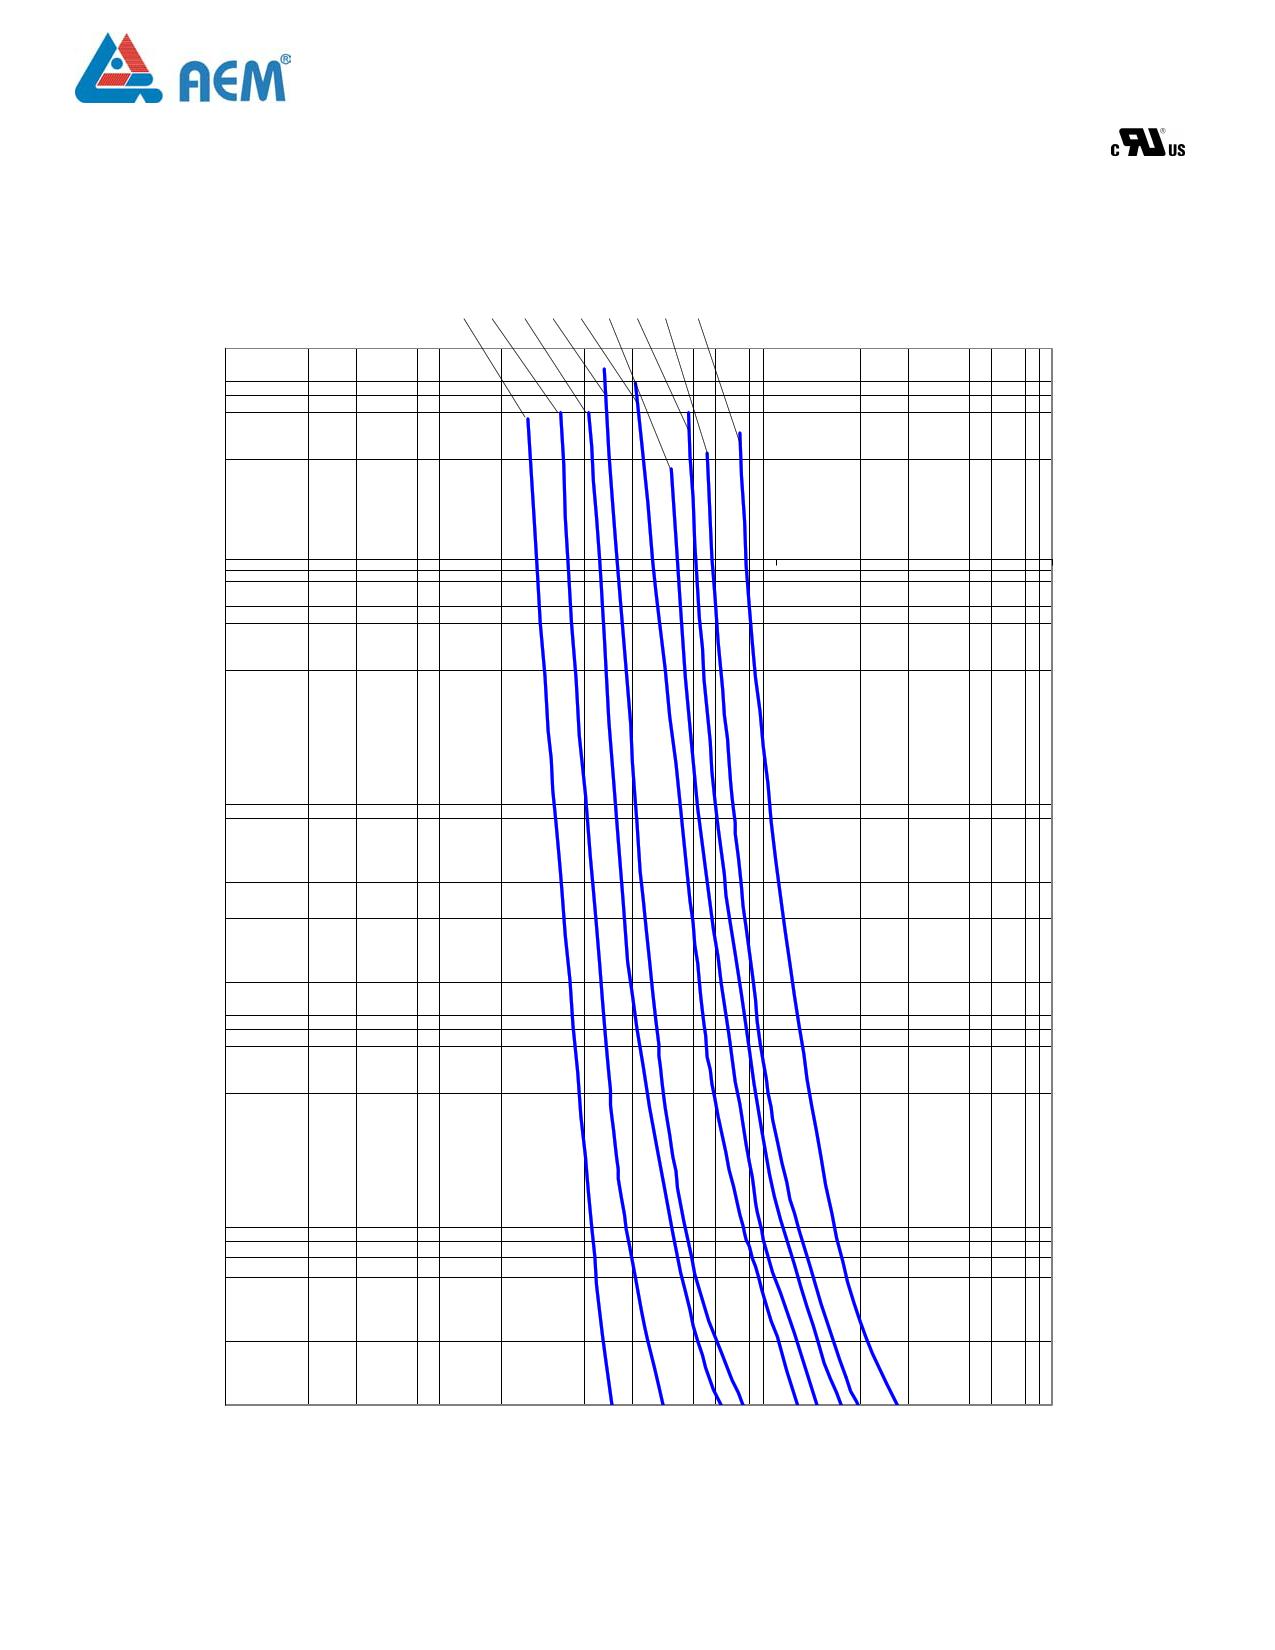 F0603FA0750V032T arduino